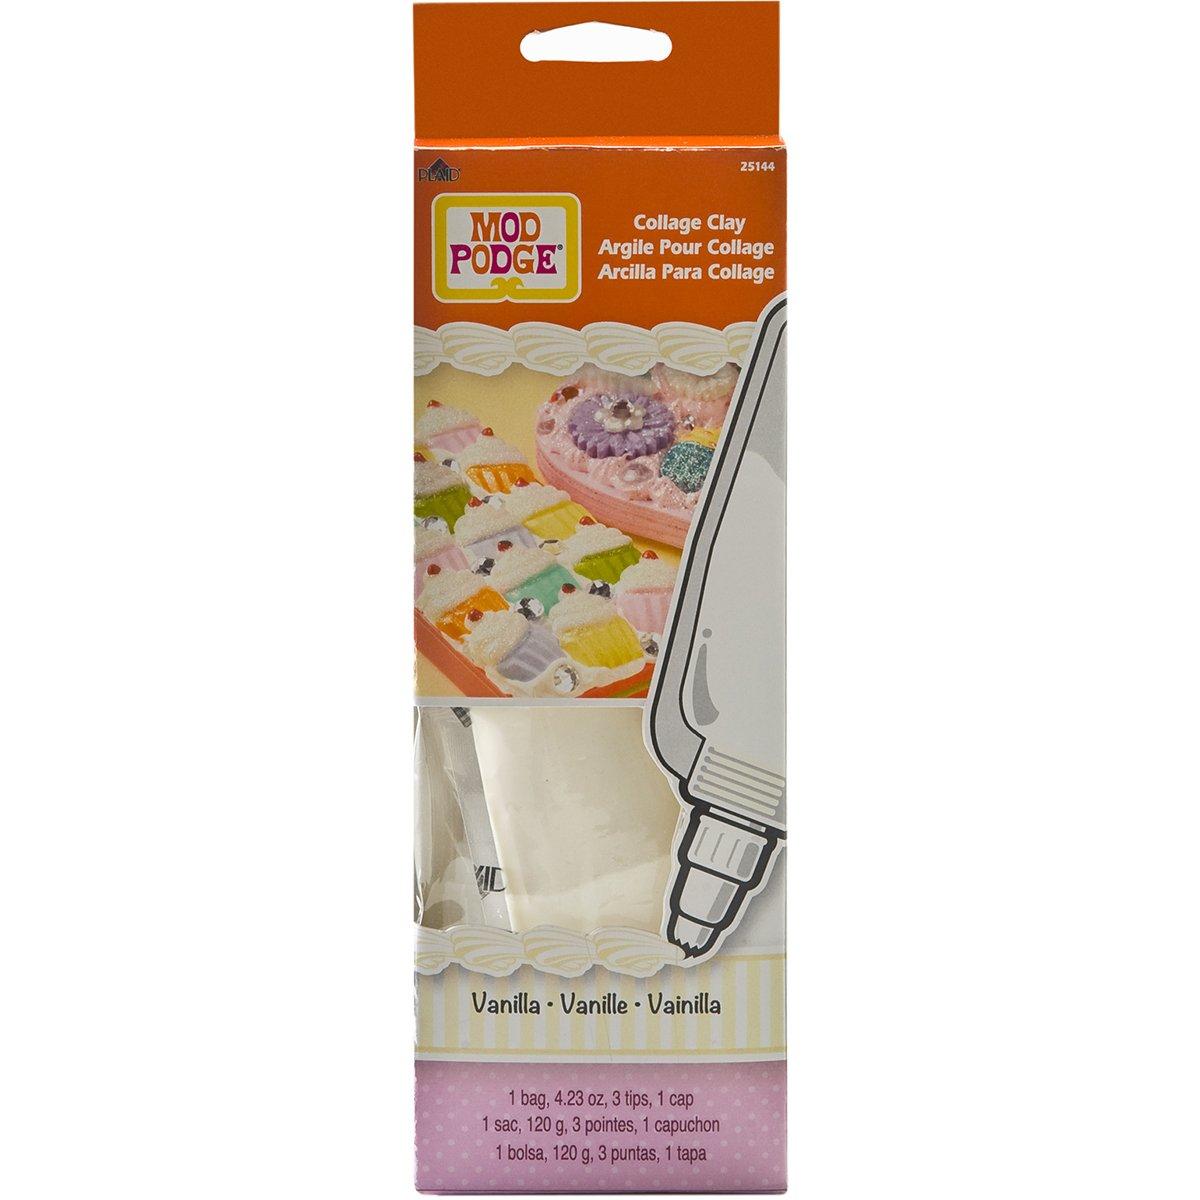 Mod Podge Collage Clay, 25144 Vanilla White 4.23Ounce Plaid Inc glue top coat craft